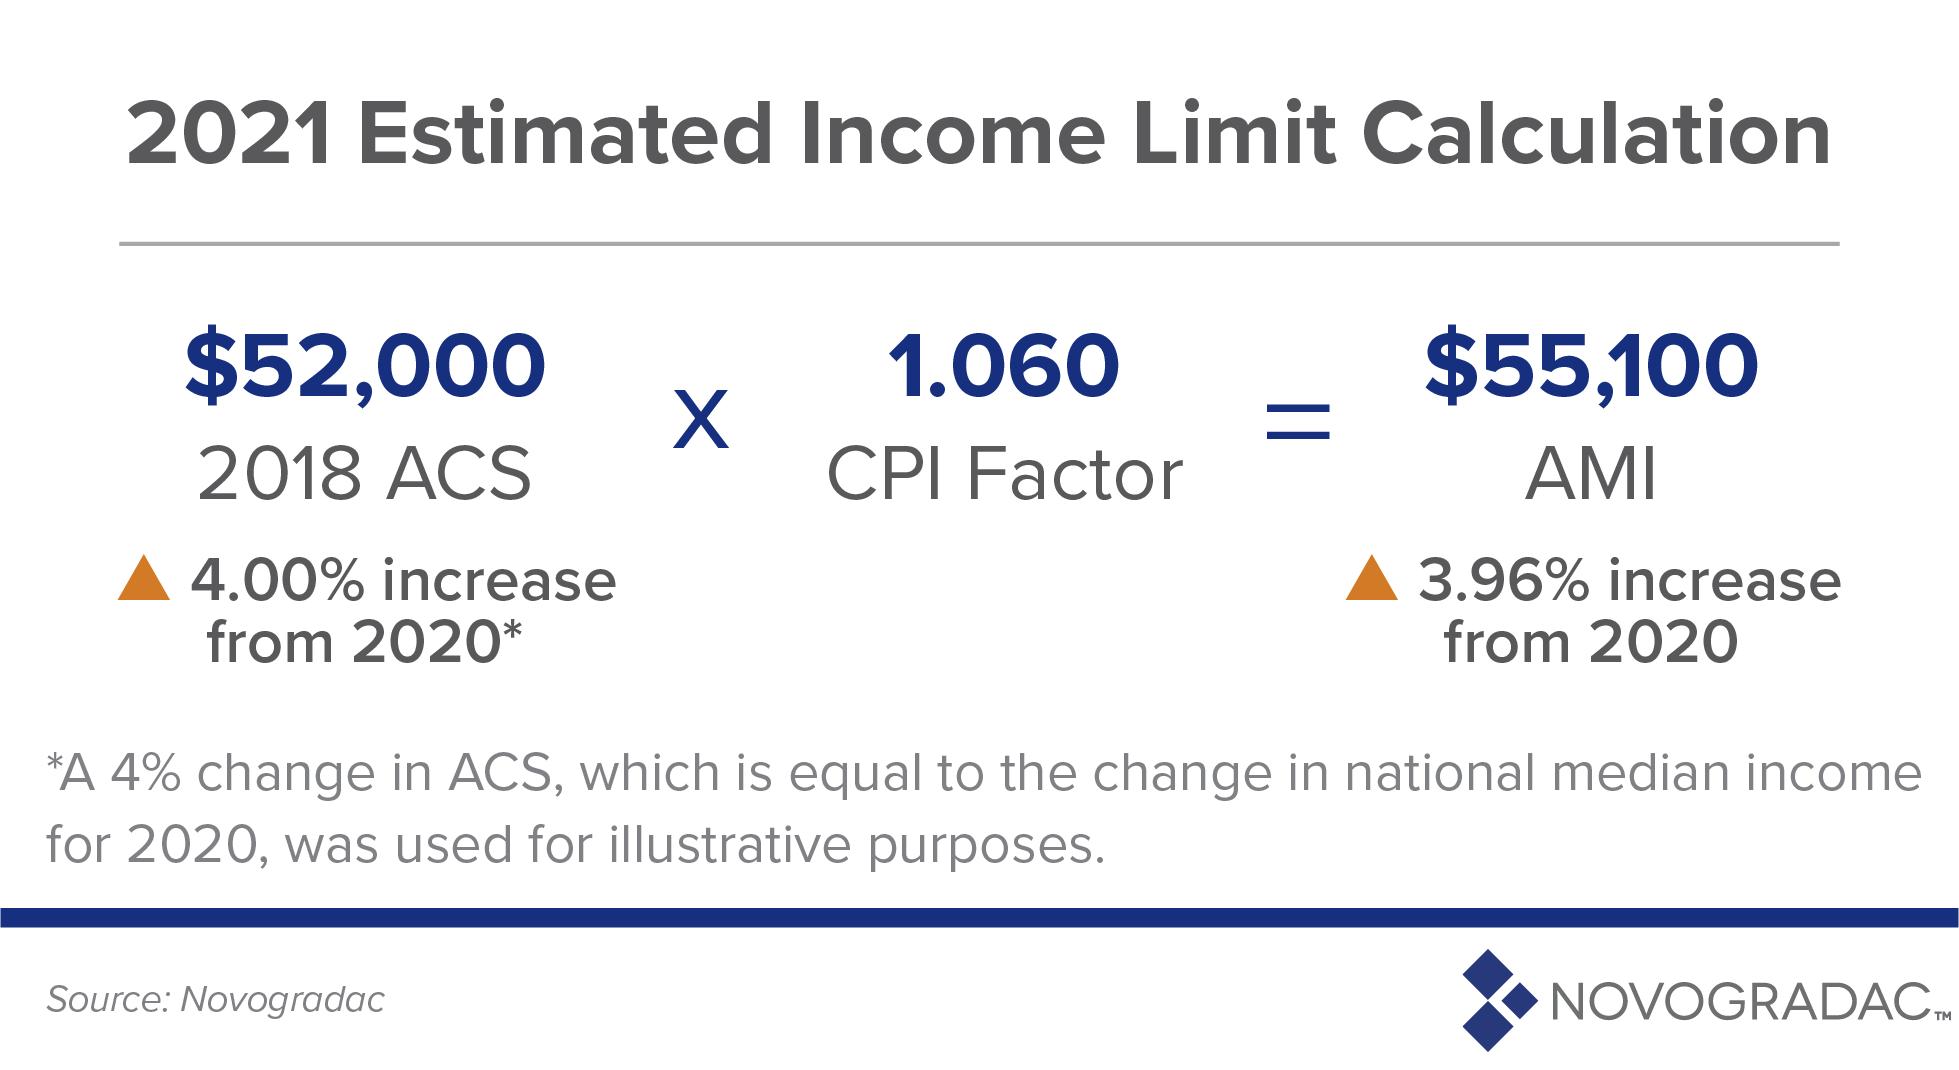 2021 Estimated Income Limit Calculation